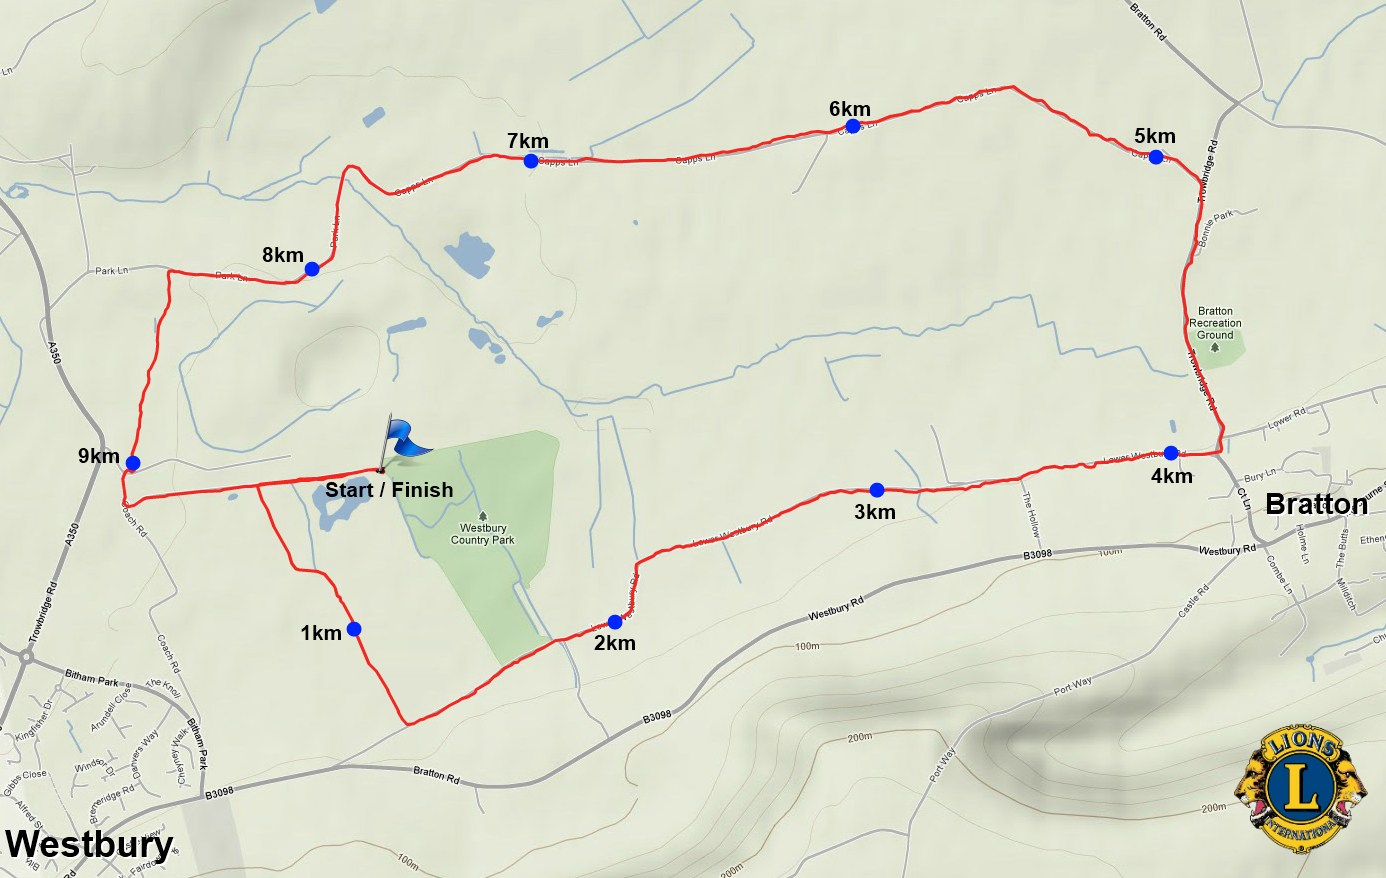 2012 10k Route